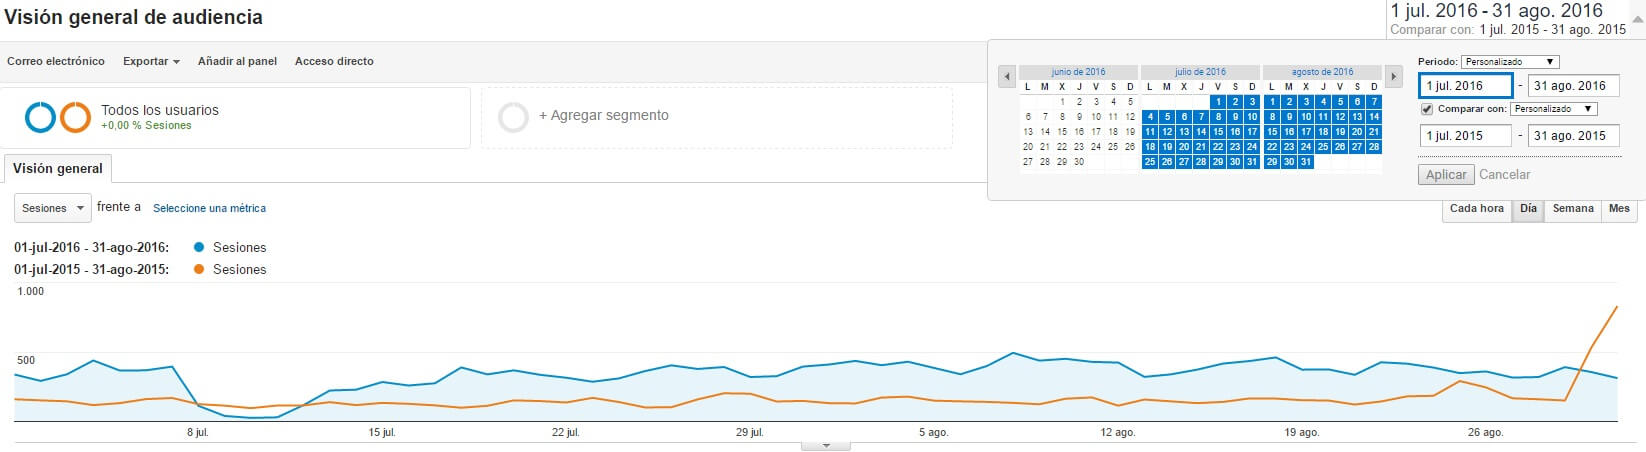 comparativa-periodos-google-analytics.jpg